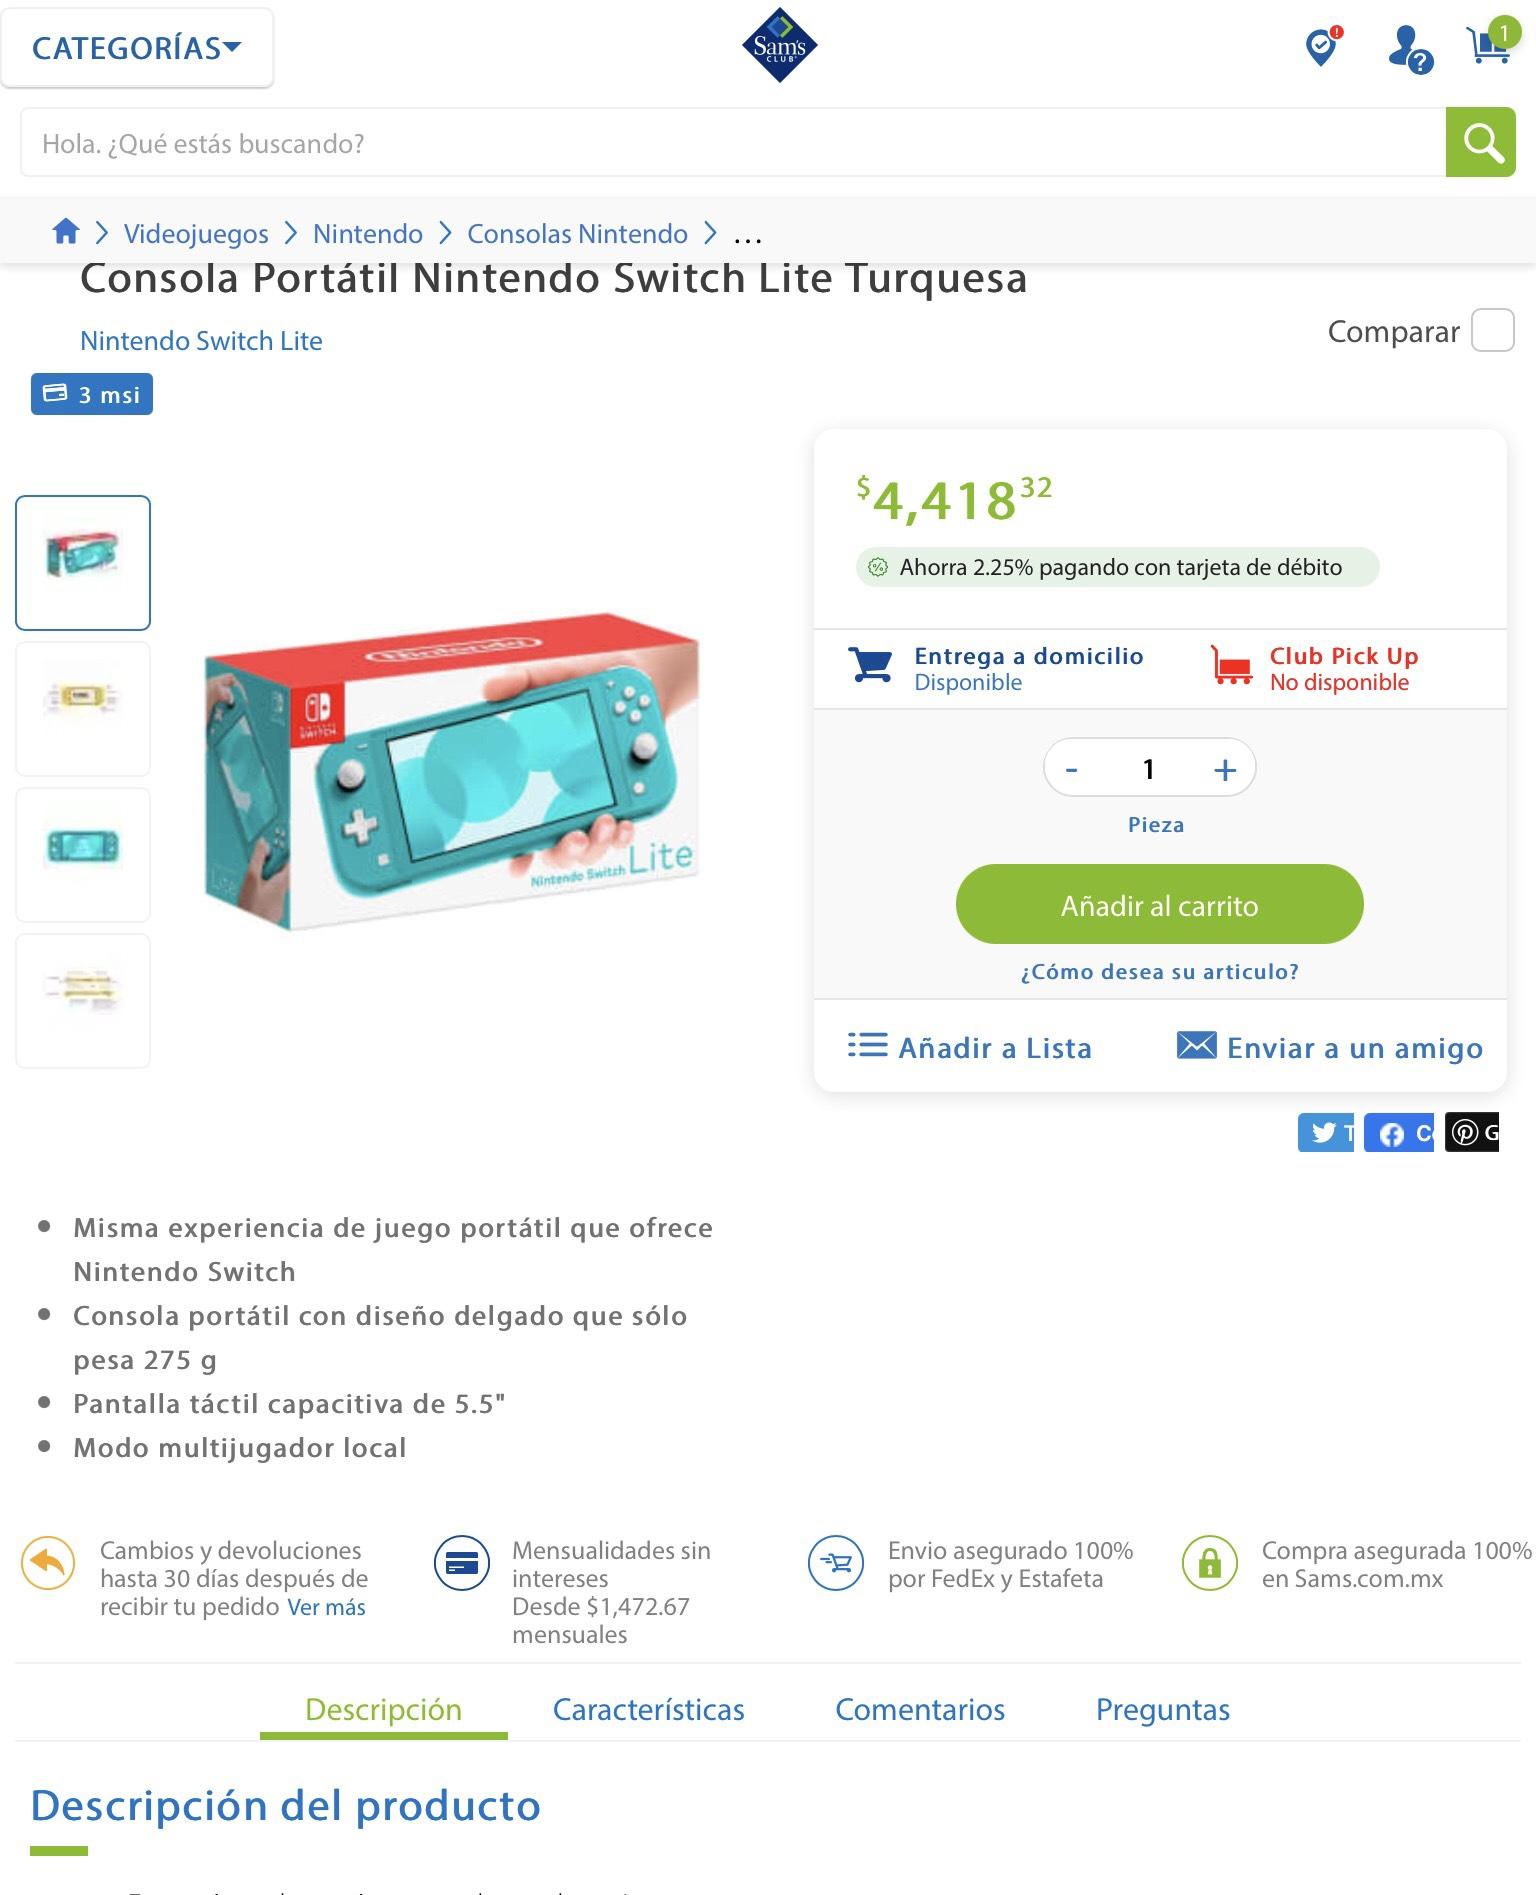 Nintendo Swith Lite color turquesa en Sam's